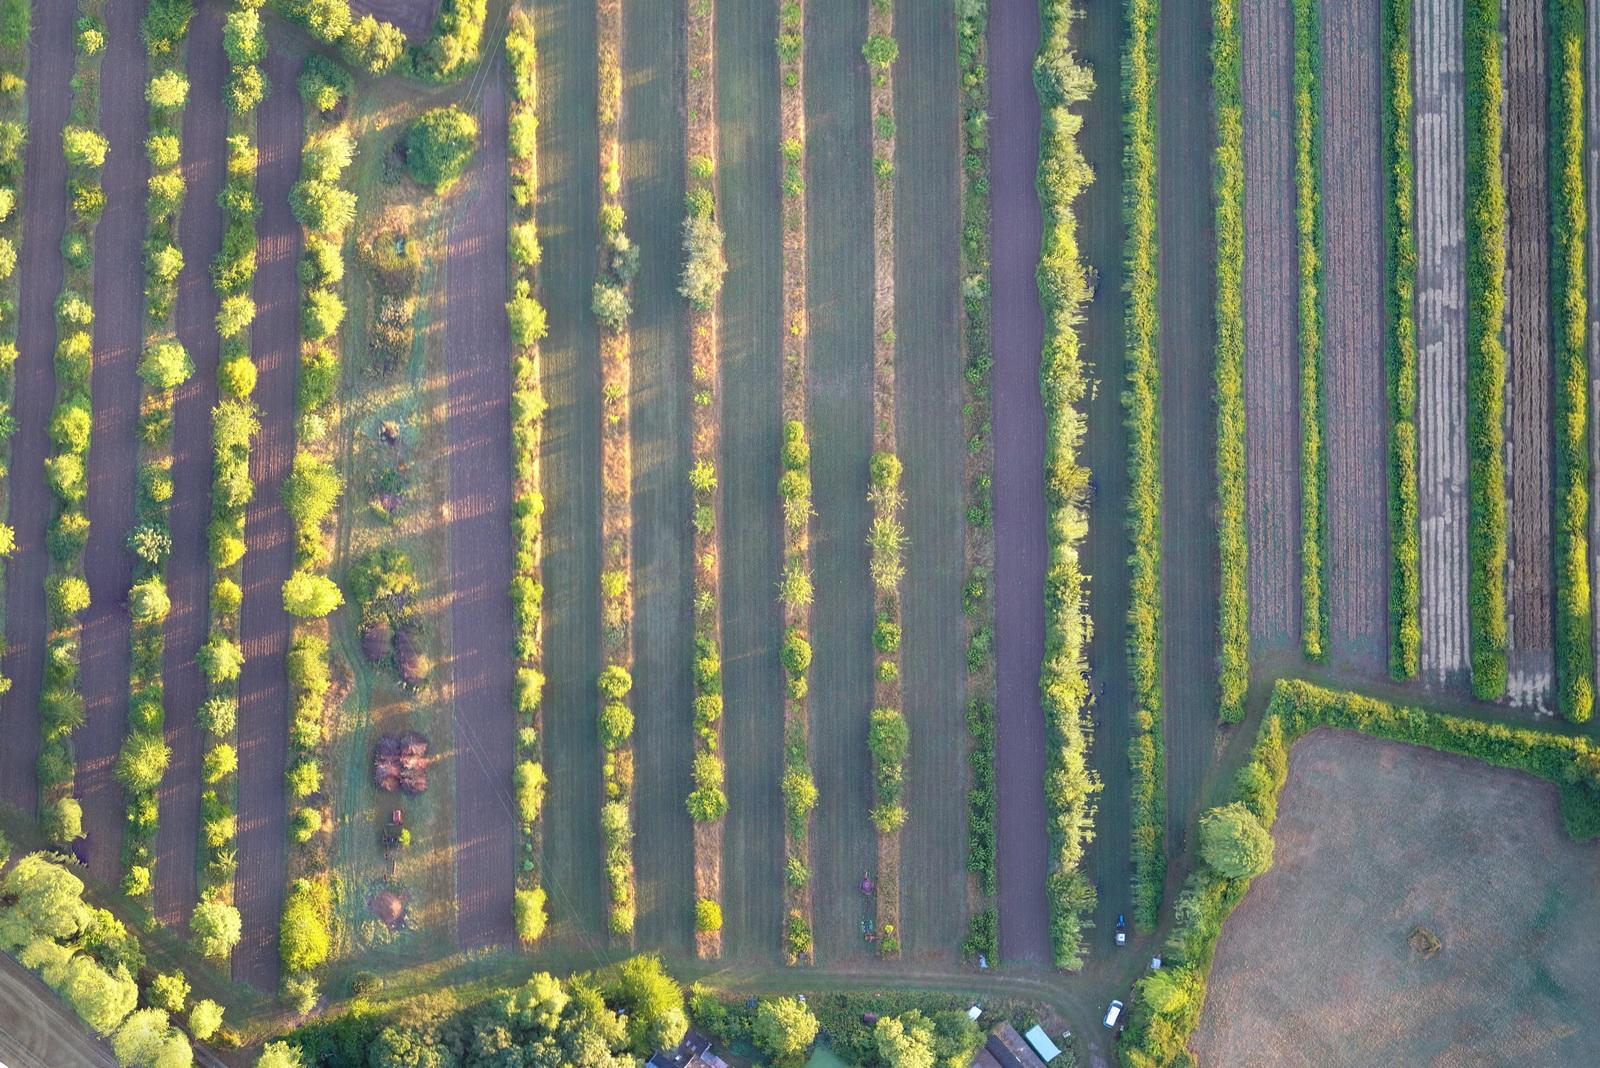 Whole Farm Planning Part 2, Agroforestry Course, Farming Course, Regenerative Agriculture Course, Wakelyns Farm